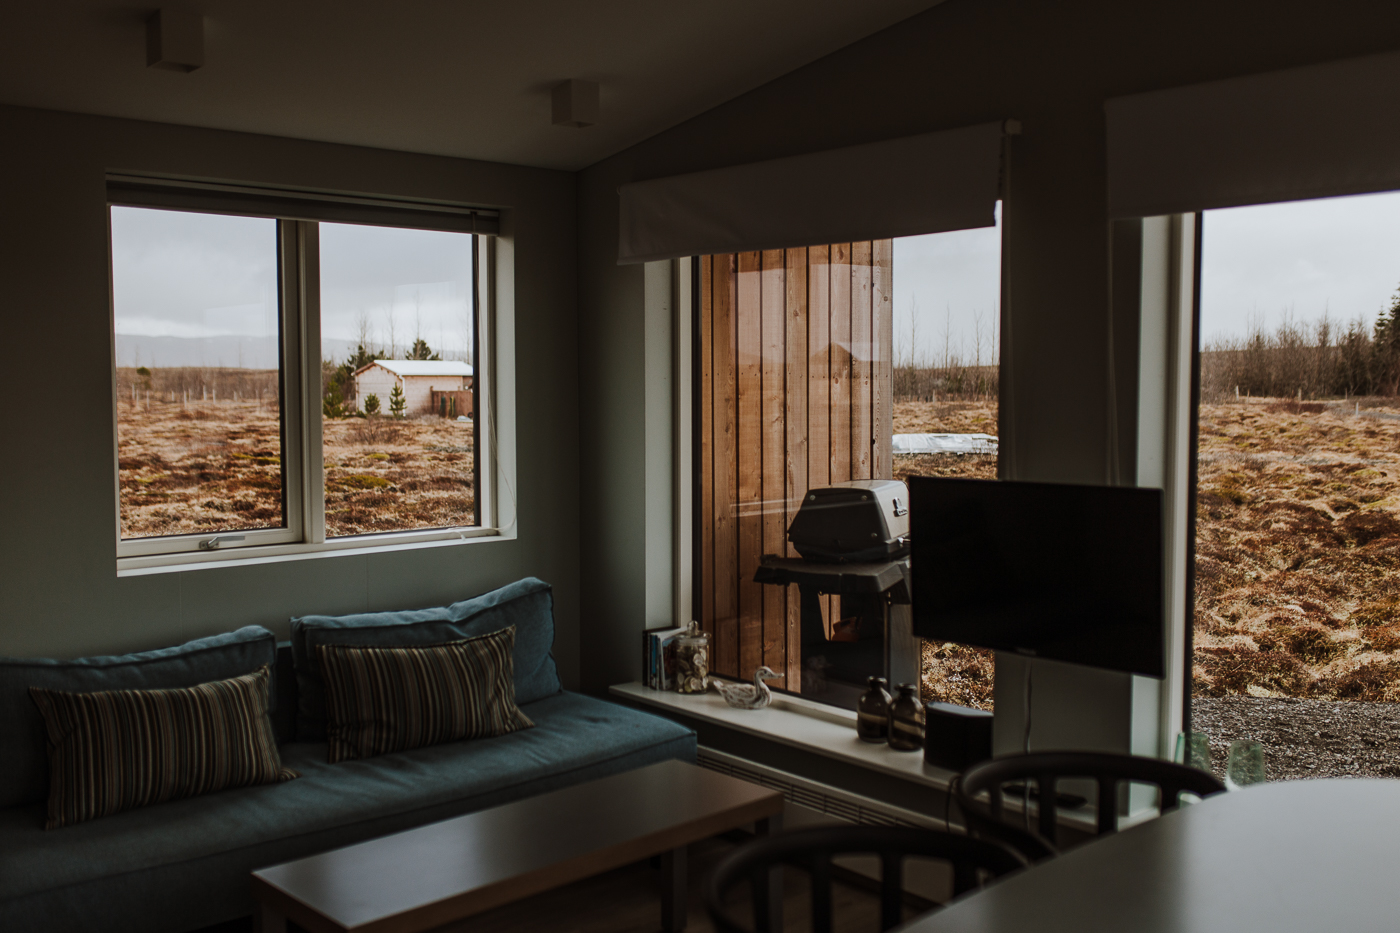 Golden Circle Cabin, Laugarvatn